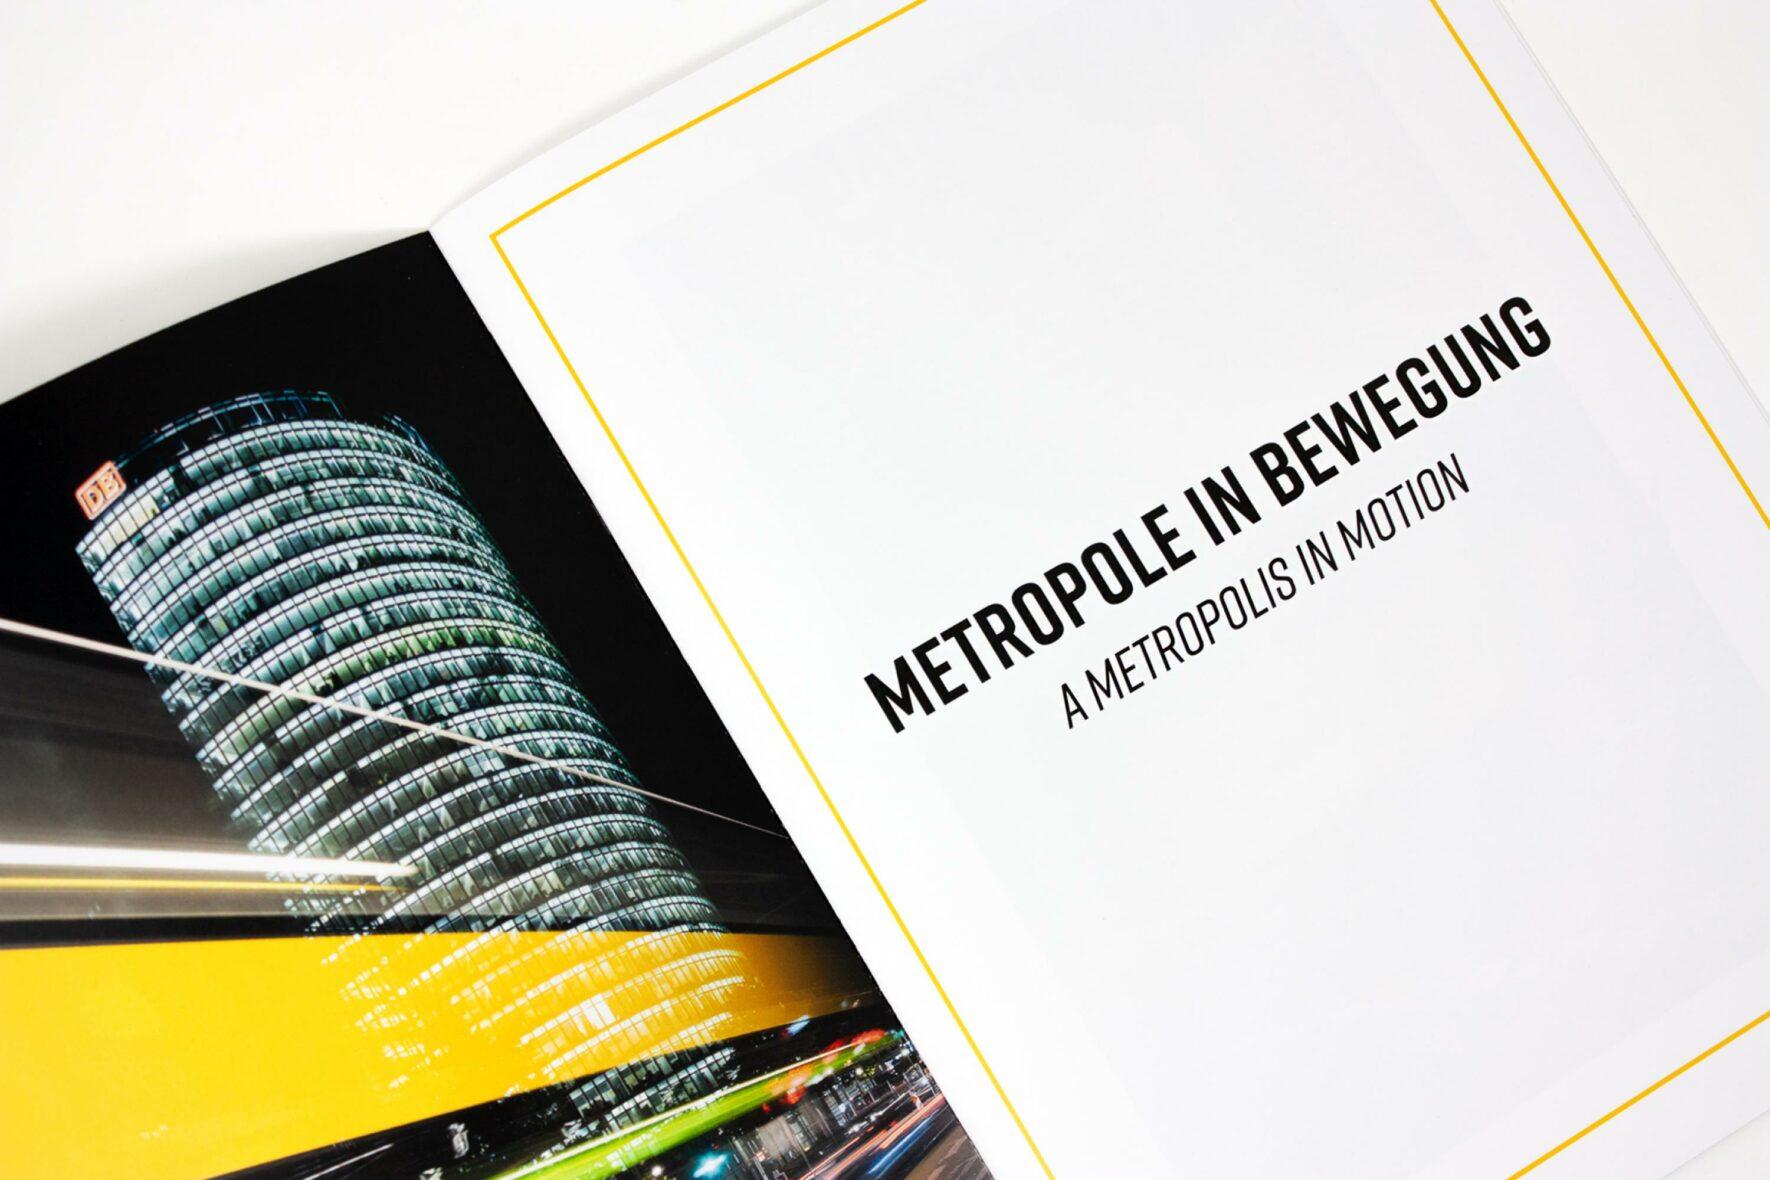 Immobilienbranding-Luetzow-Trendcity-Broschüre-FORMLOS-berlin-Print_MG_8332